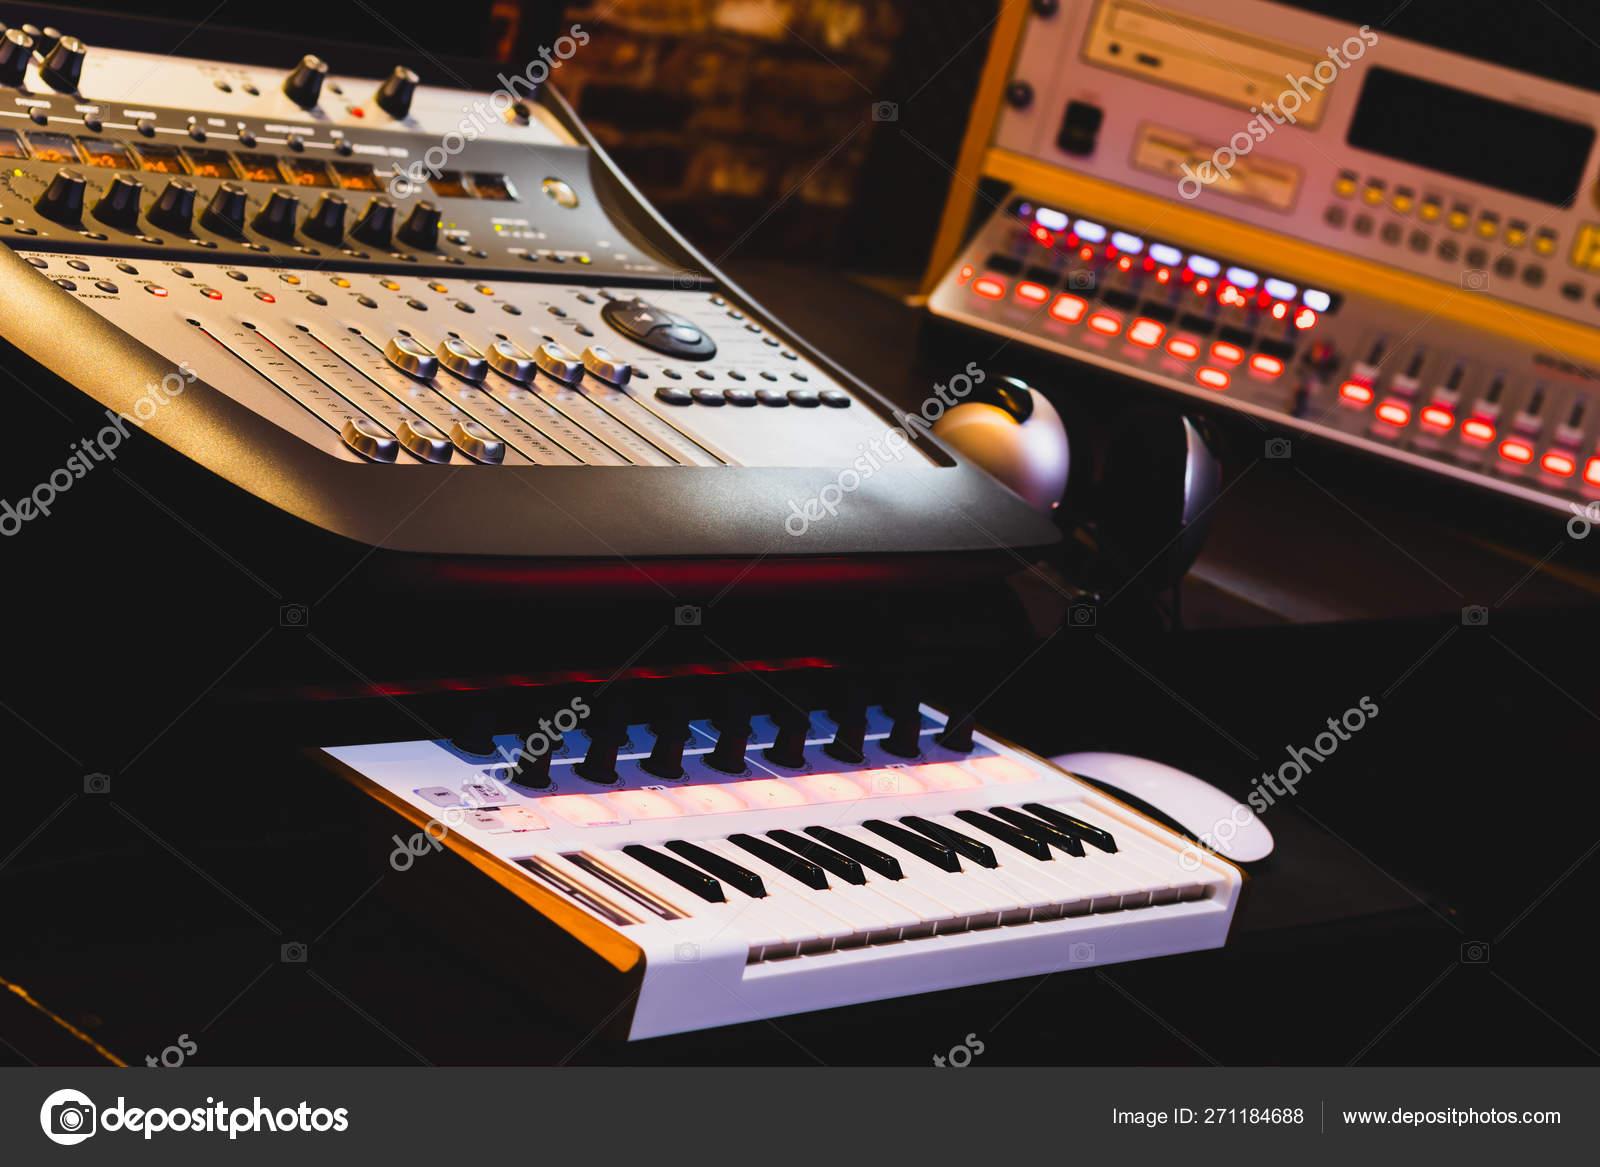 Professional Music Production Equipment Home Studio — Stock